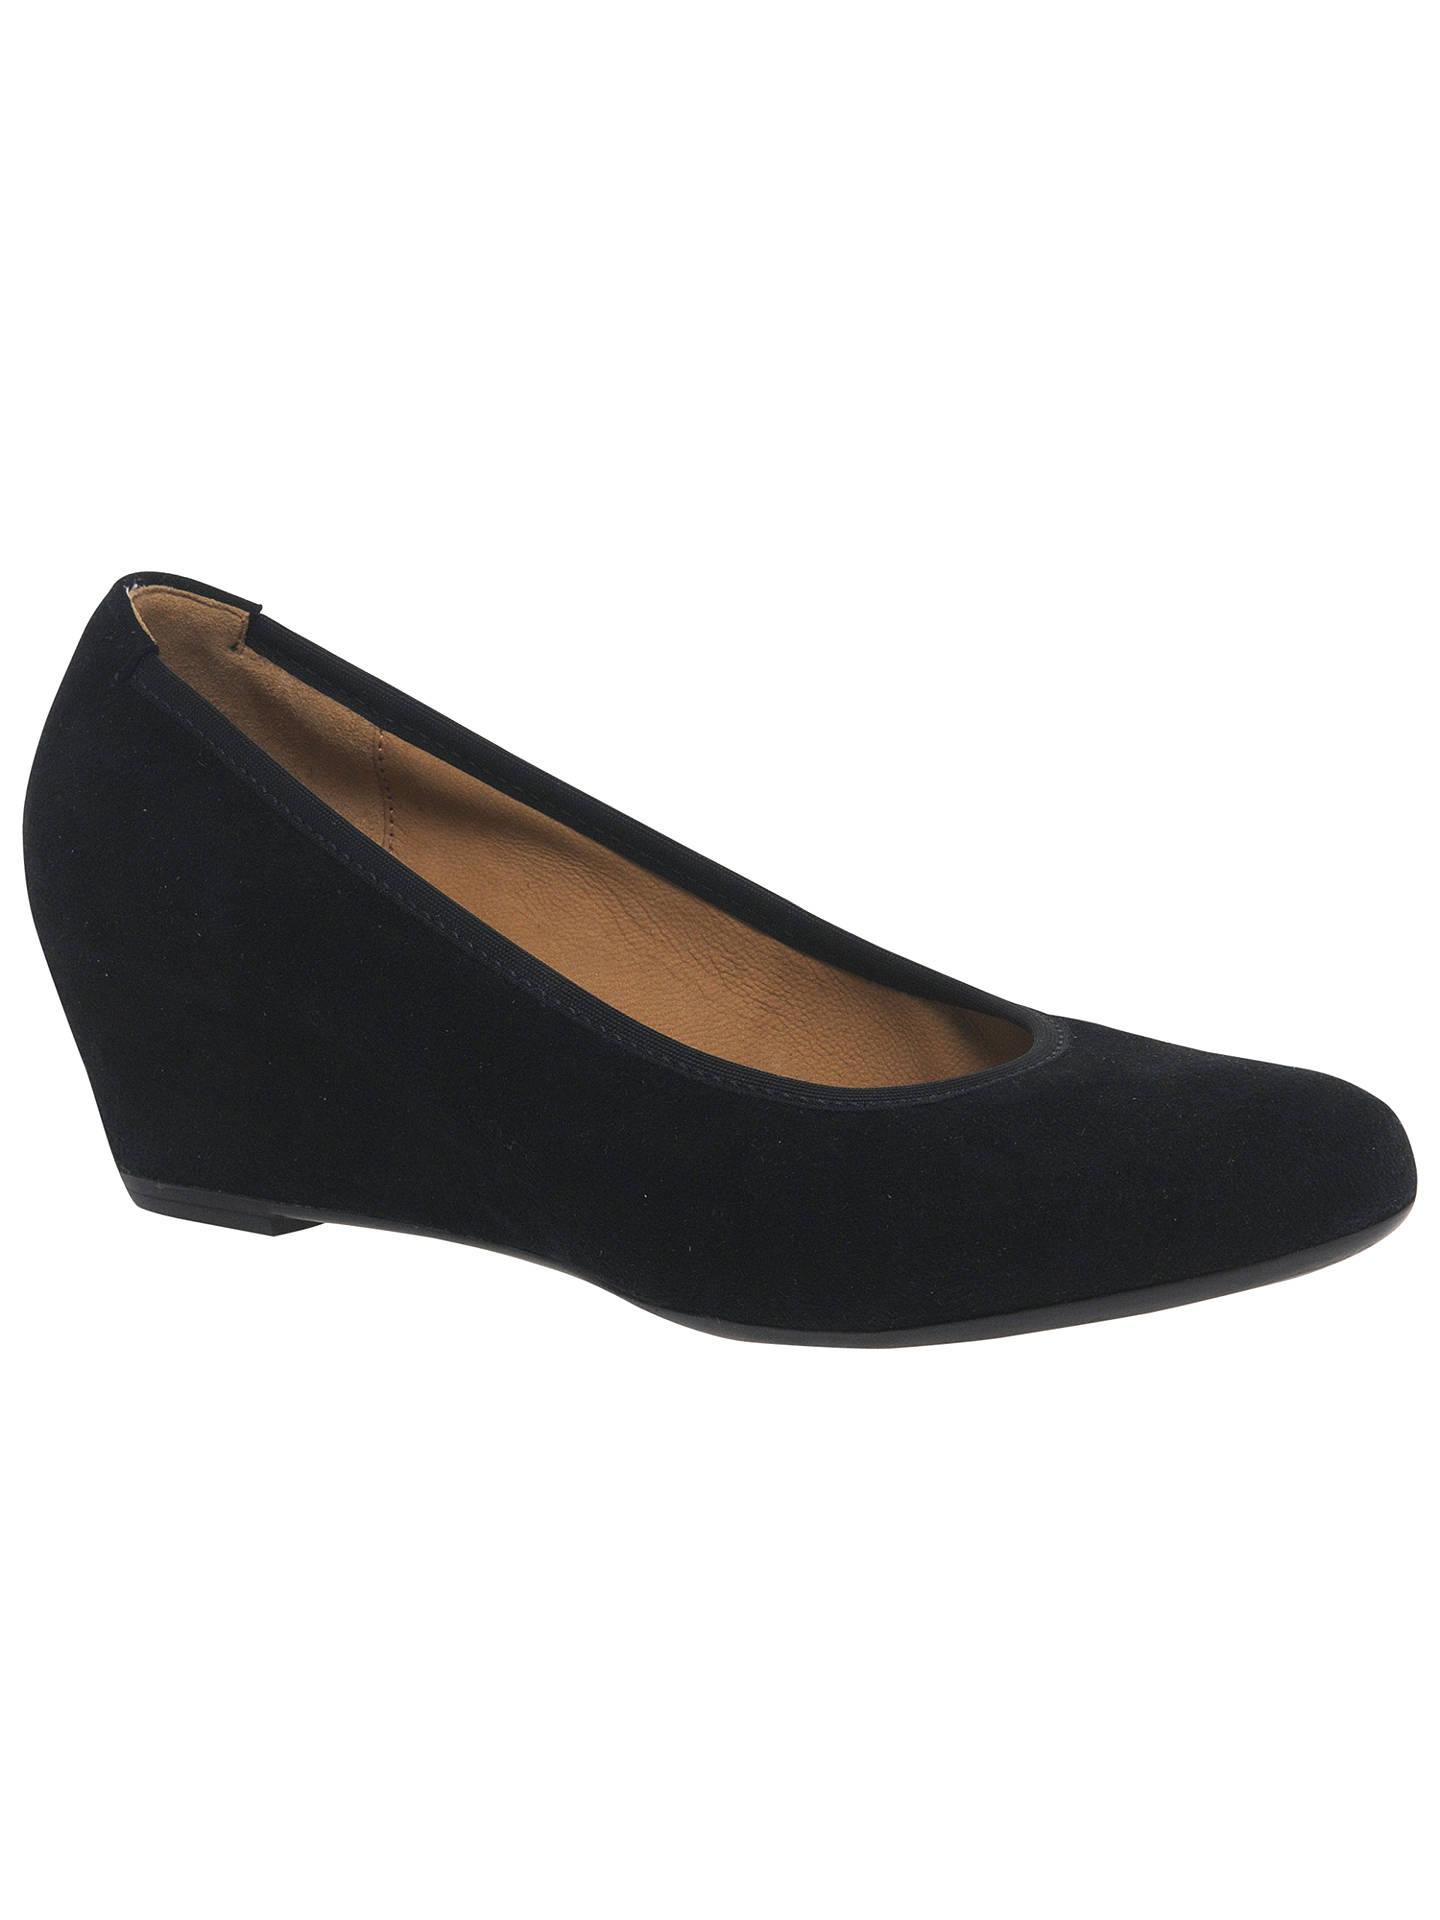 5b4675928e95 Buy Gabor Fantasy Wedge Heeled Court Shoes